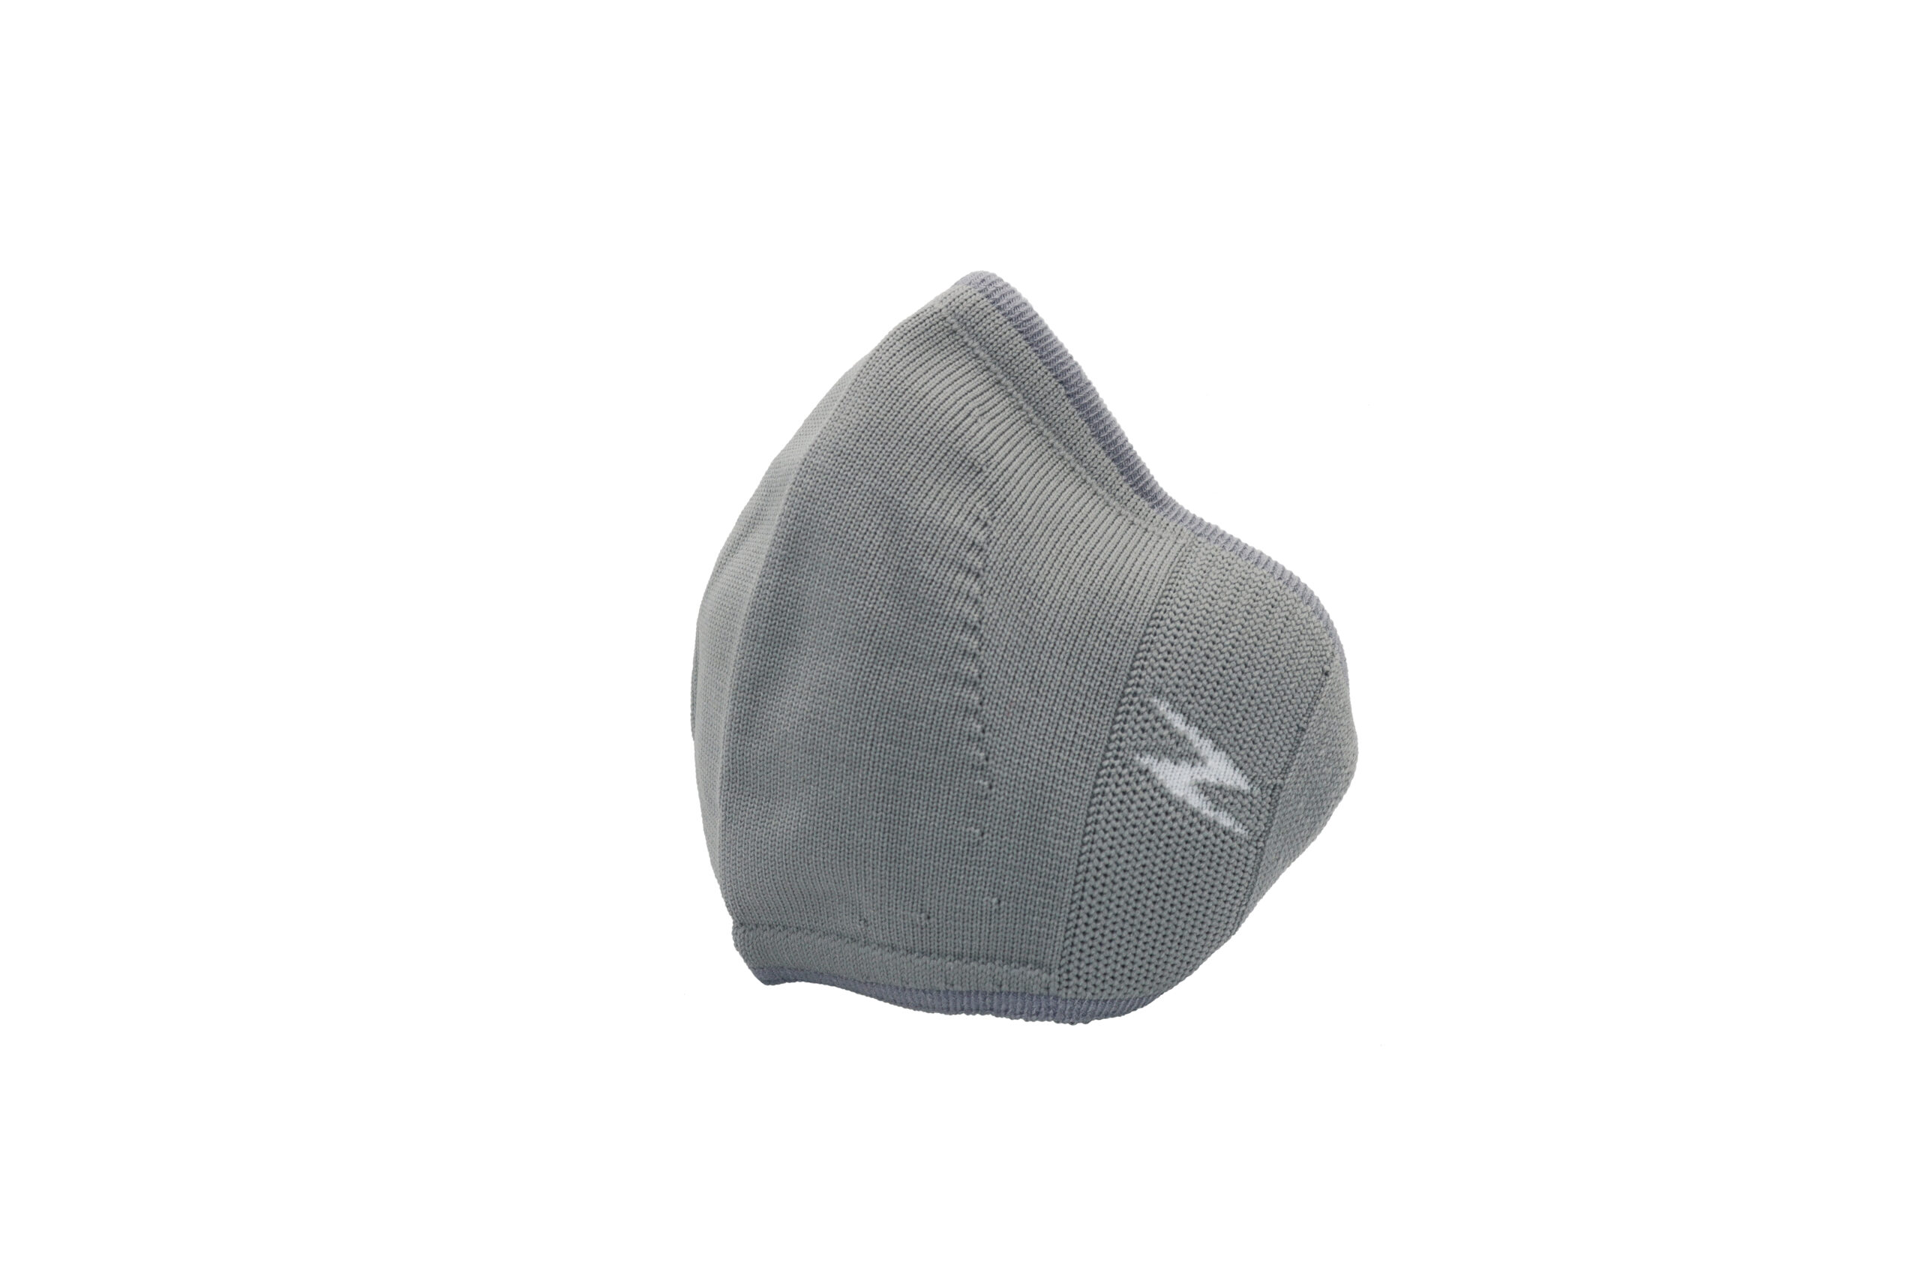 Grey reusable face covering